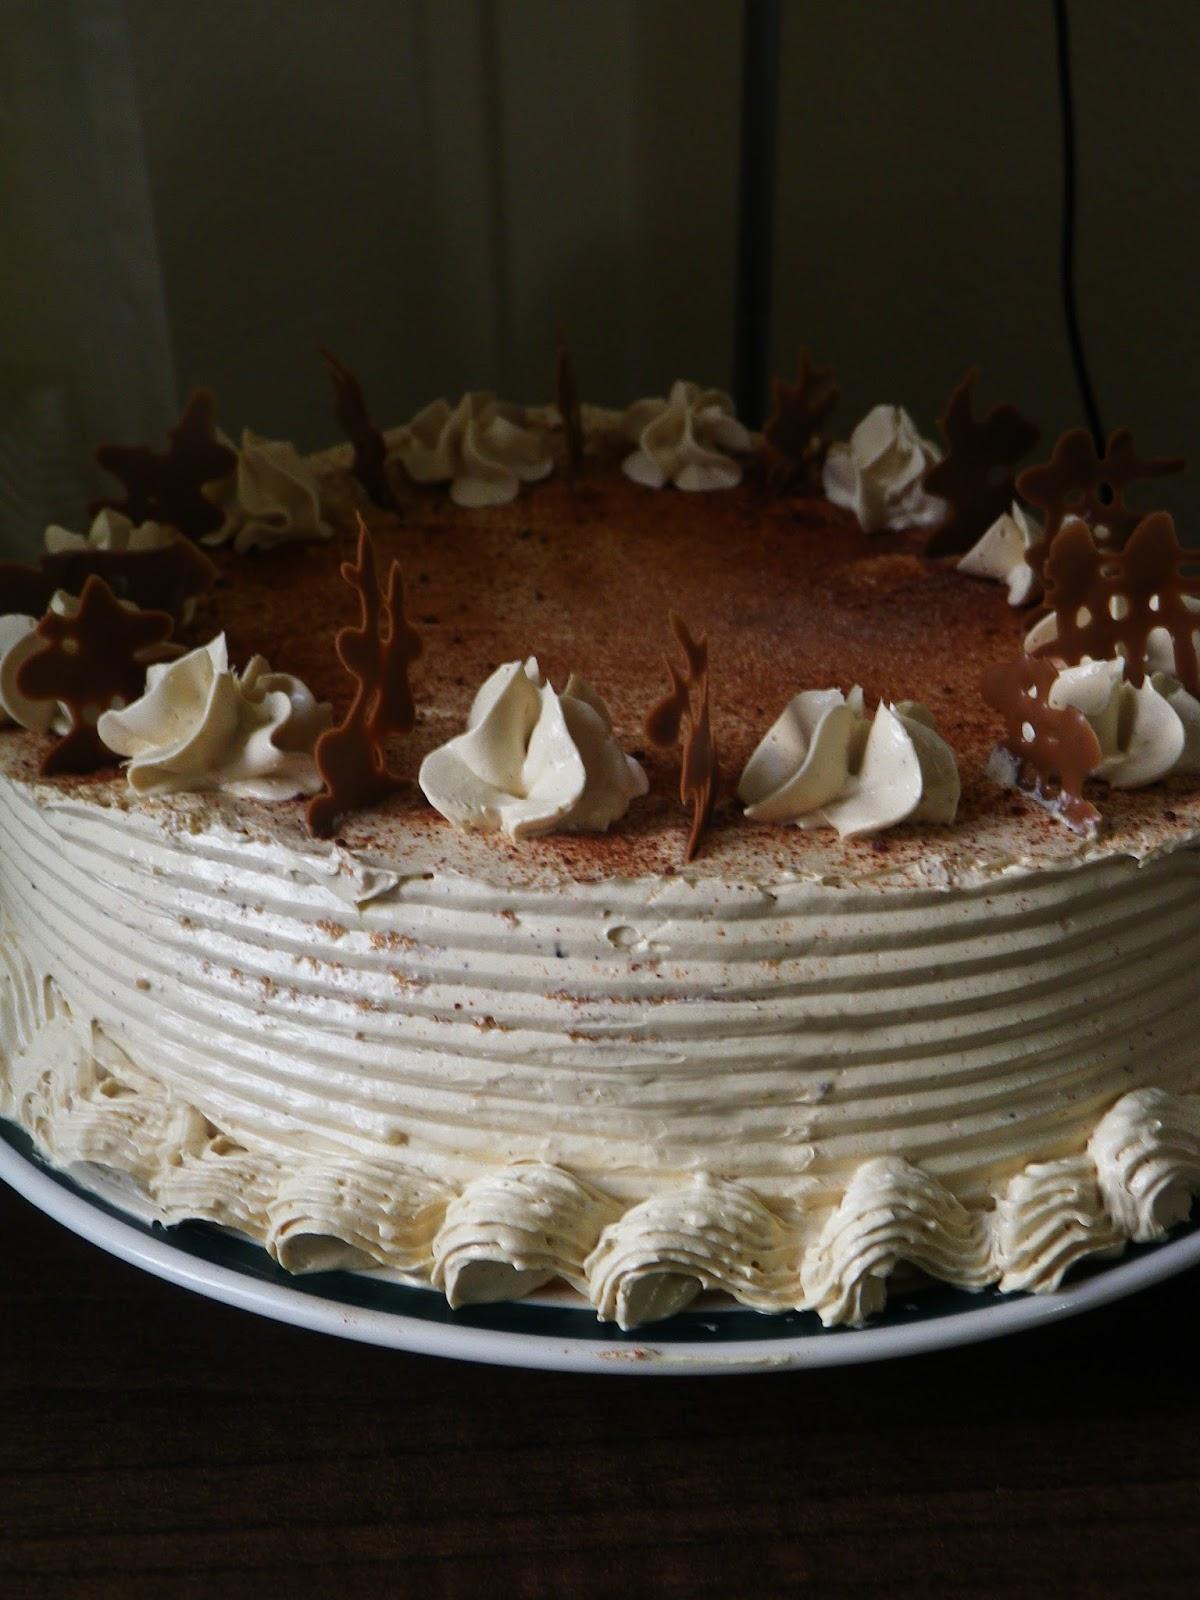 How To Make Mocha Cake Like Goldilocks